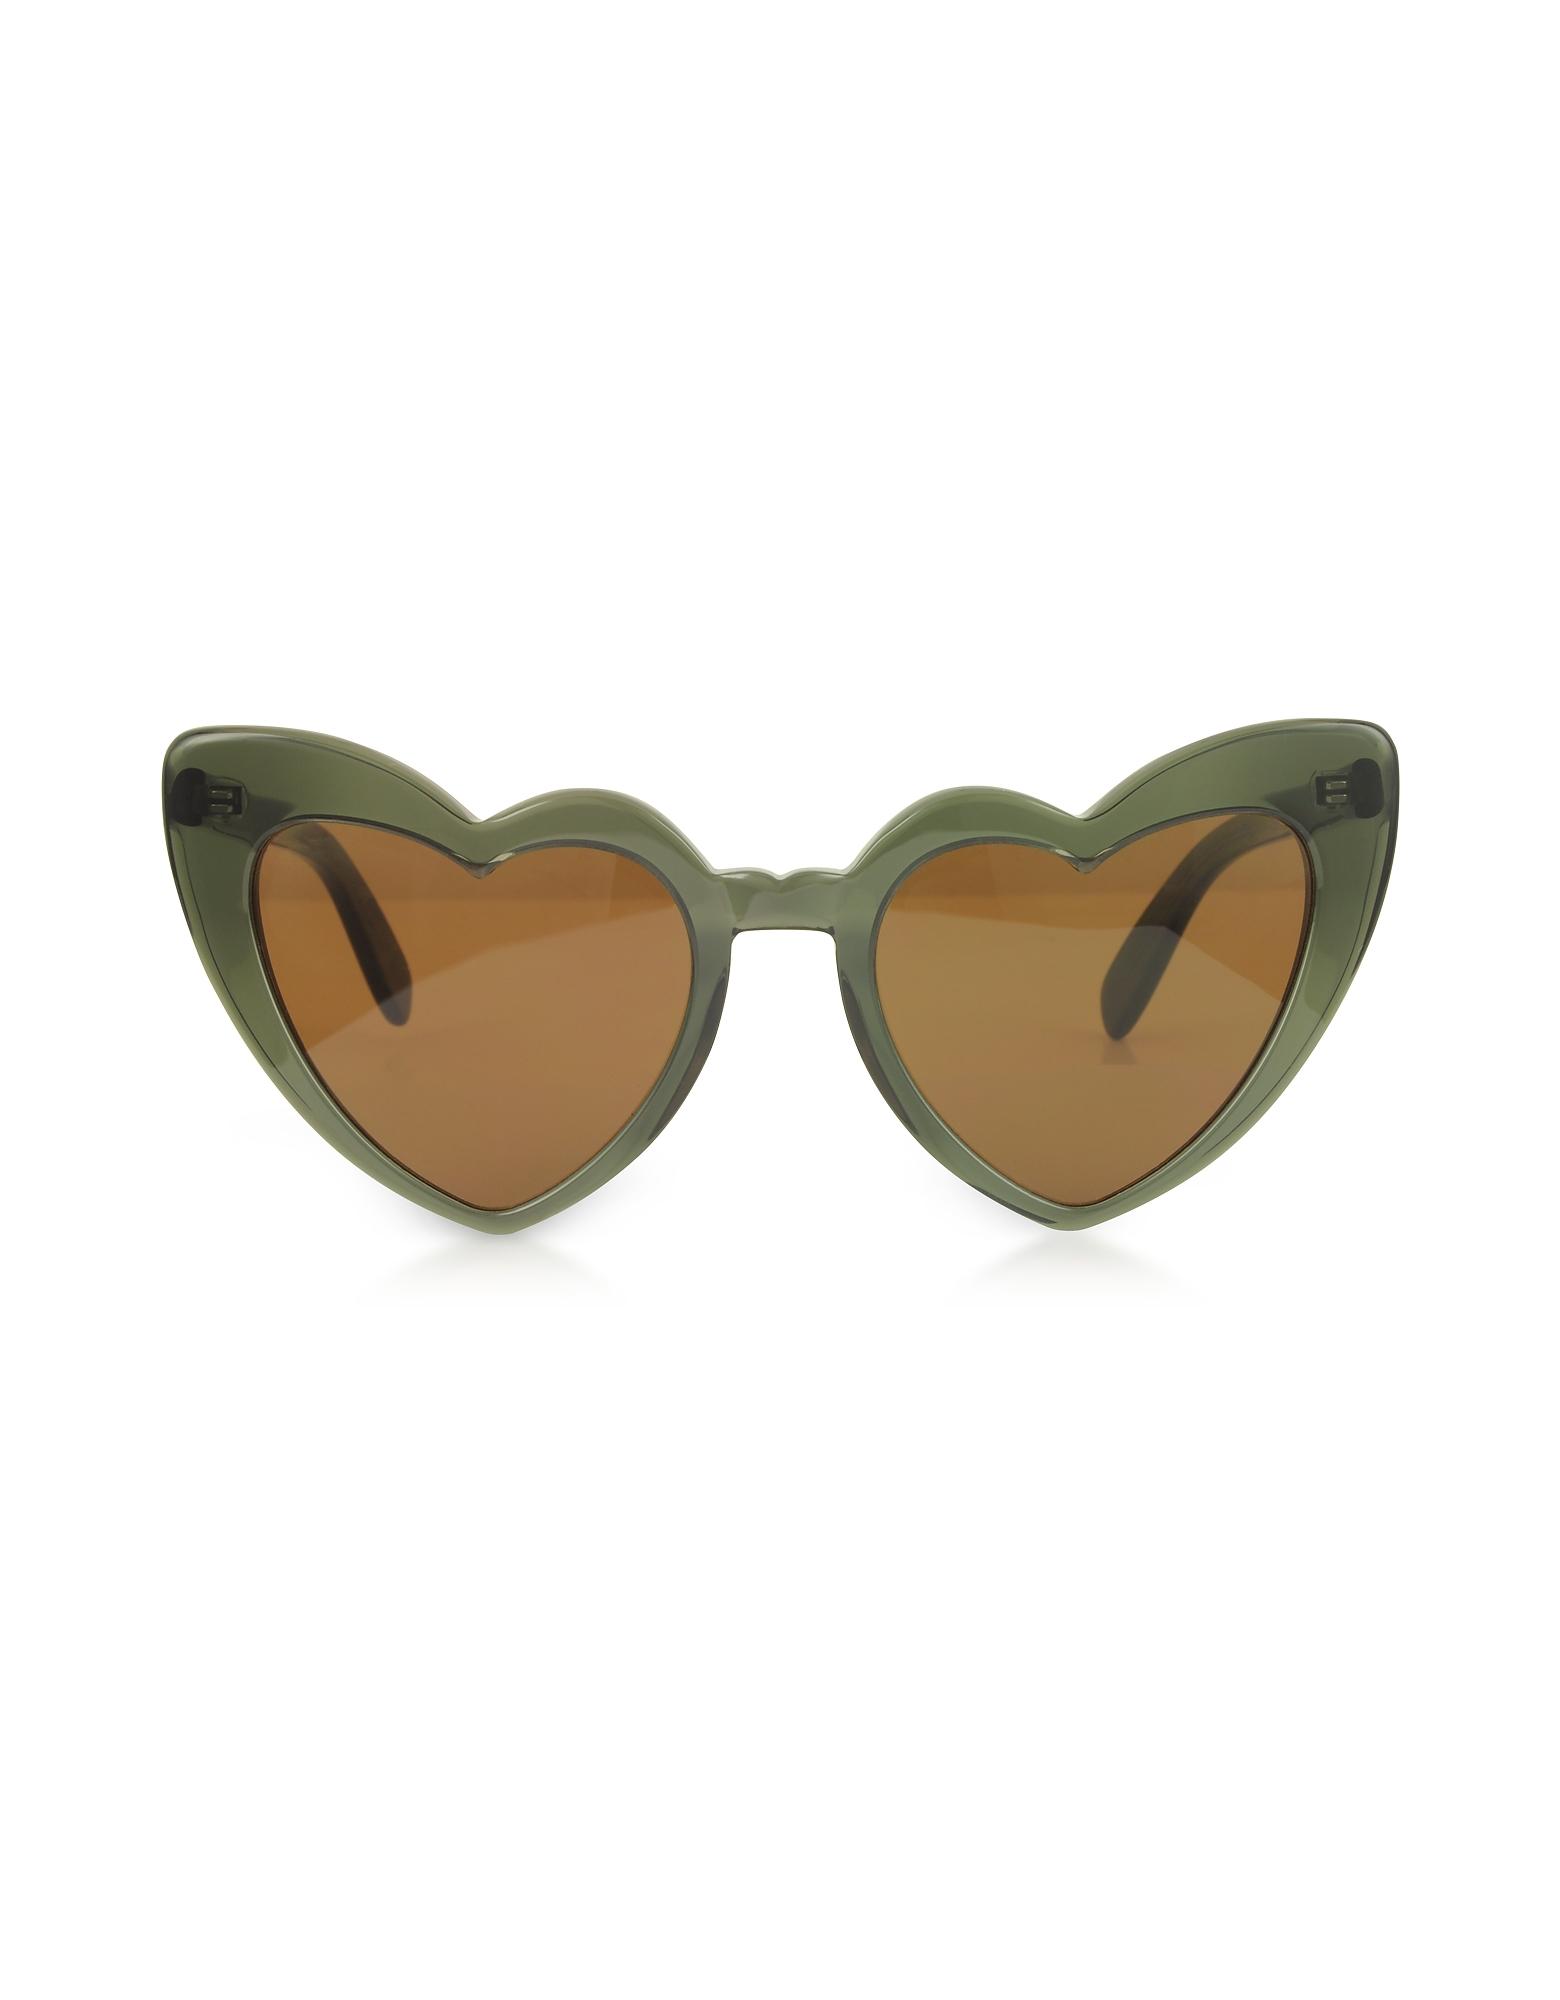 SL 181 Louluo Heart Acetate Women's Sunglasses